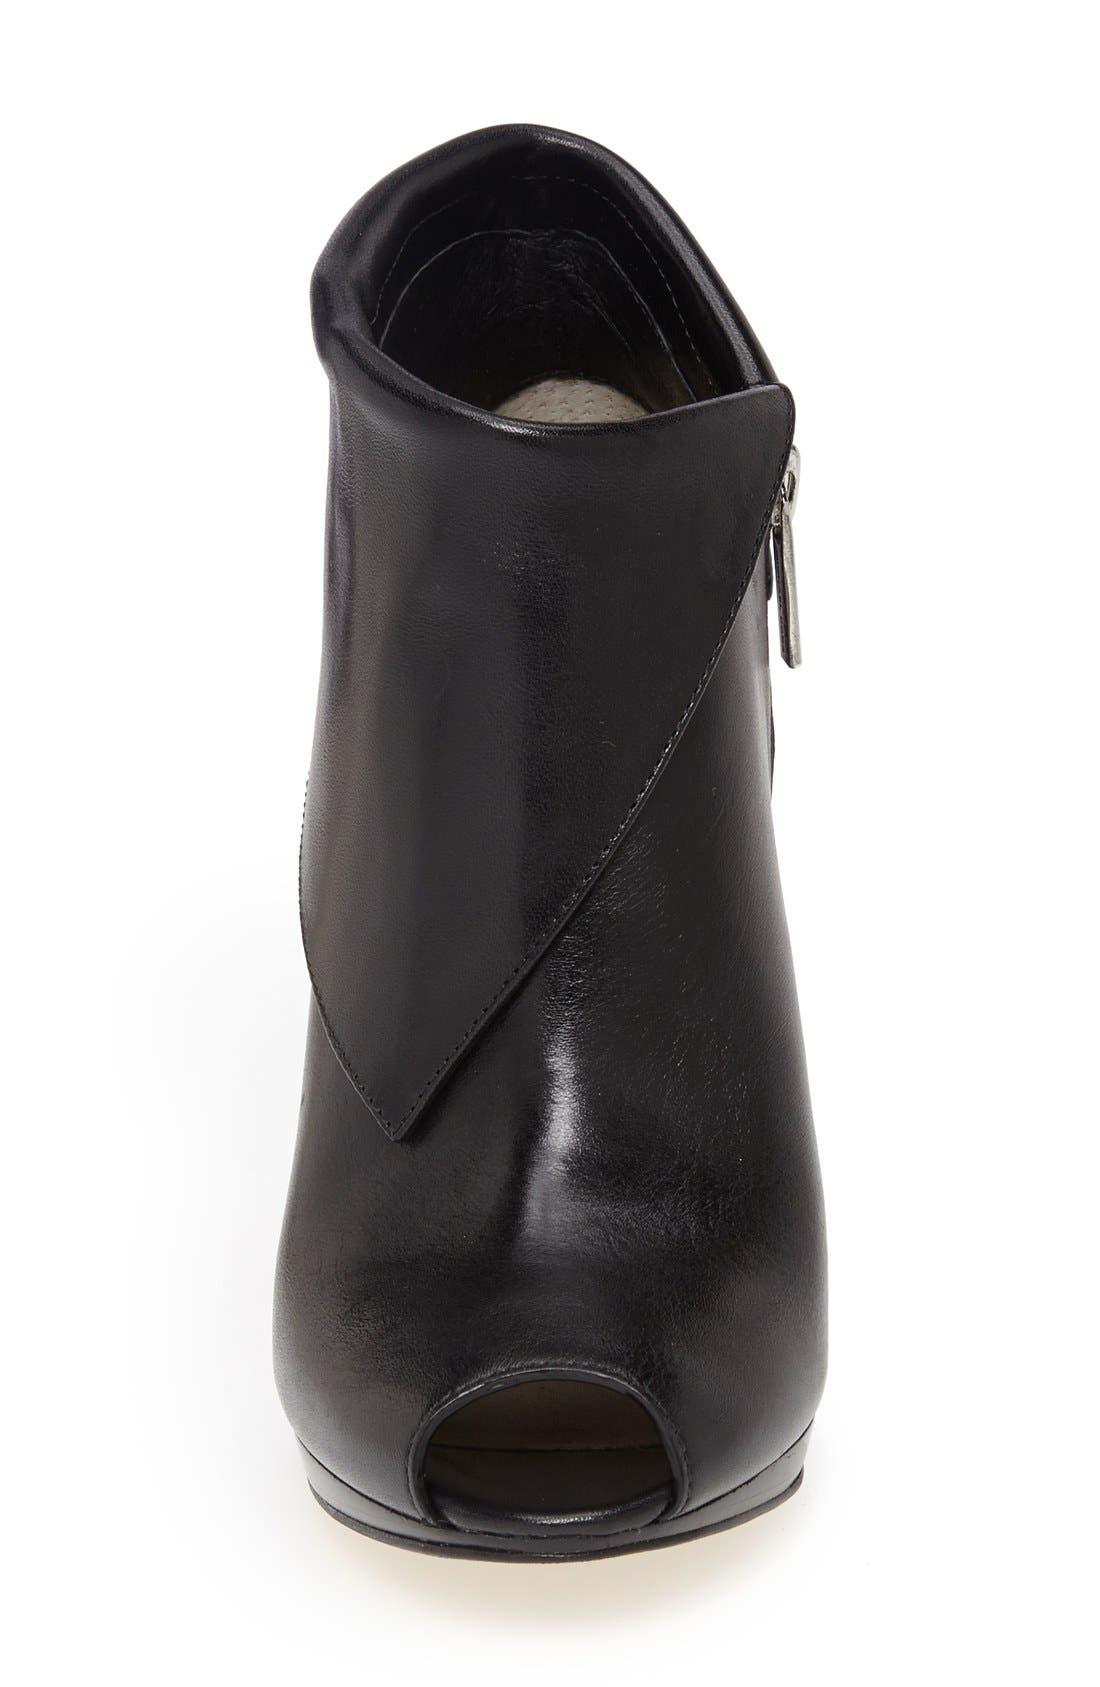 Alternate Image 3  - MICHAEL Michael Kors 'Kendra' Peep Toe Bootie (Women)